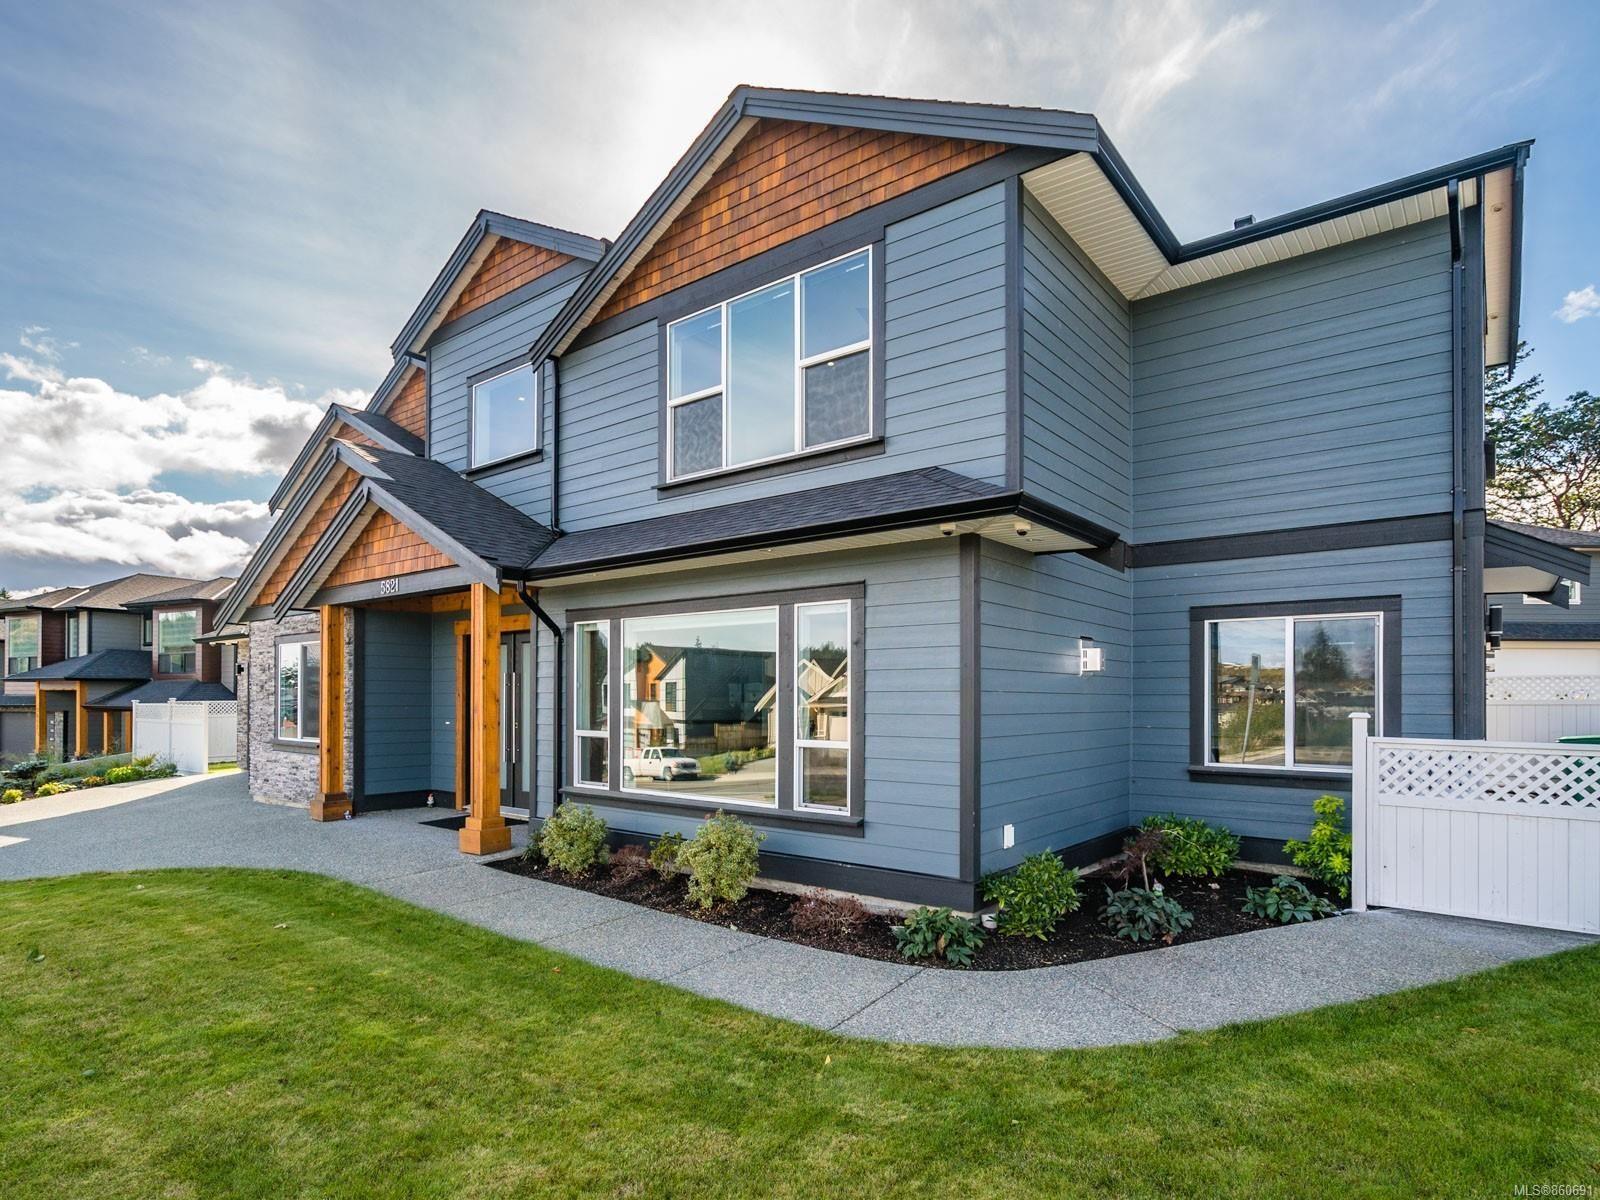 Photo 3: Photos: 5821 Linley Valley Dr in : Na North Nanaimo House for sale (Nanaimo)  : MLS®# 860691